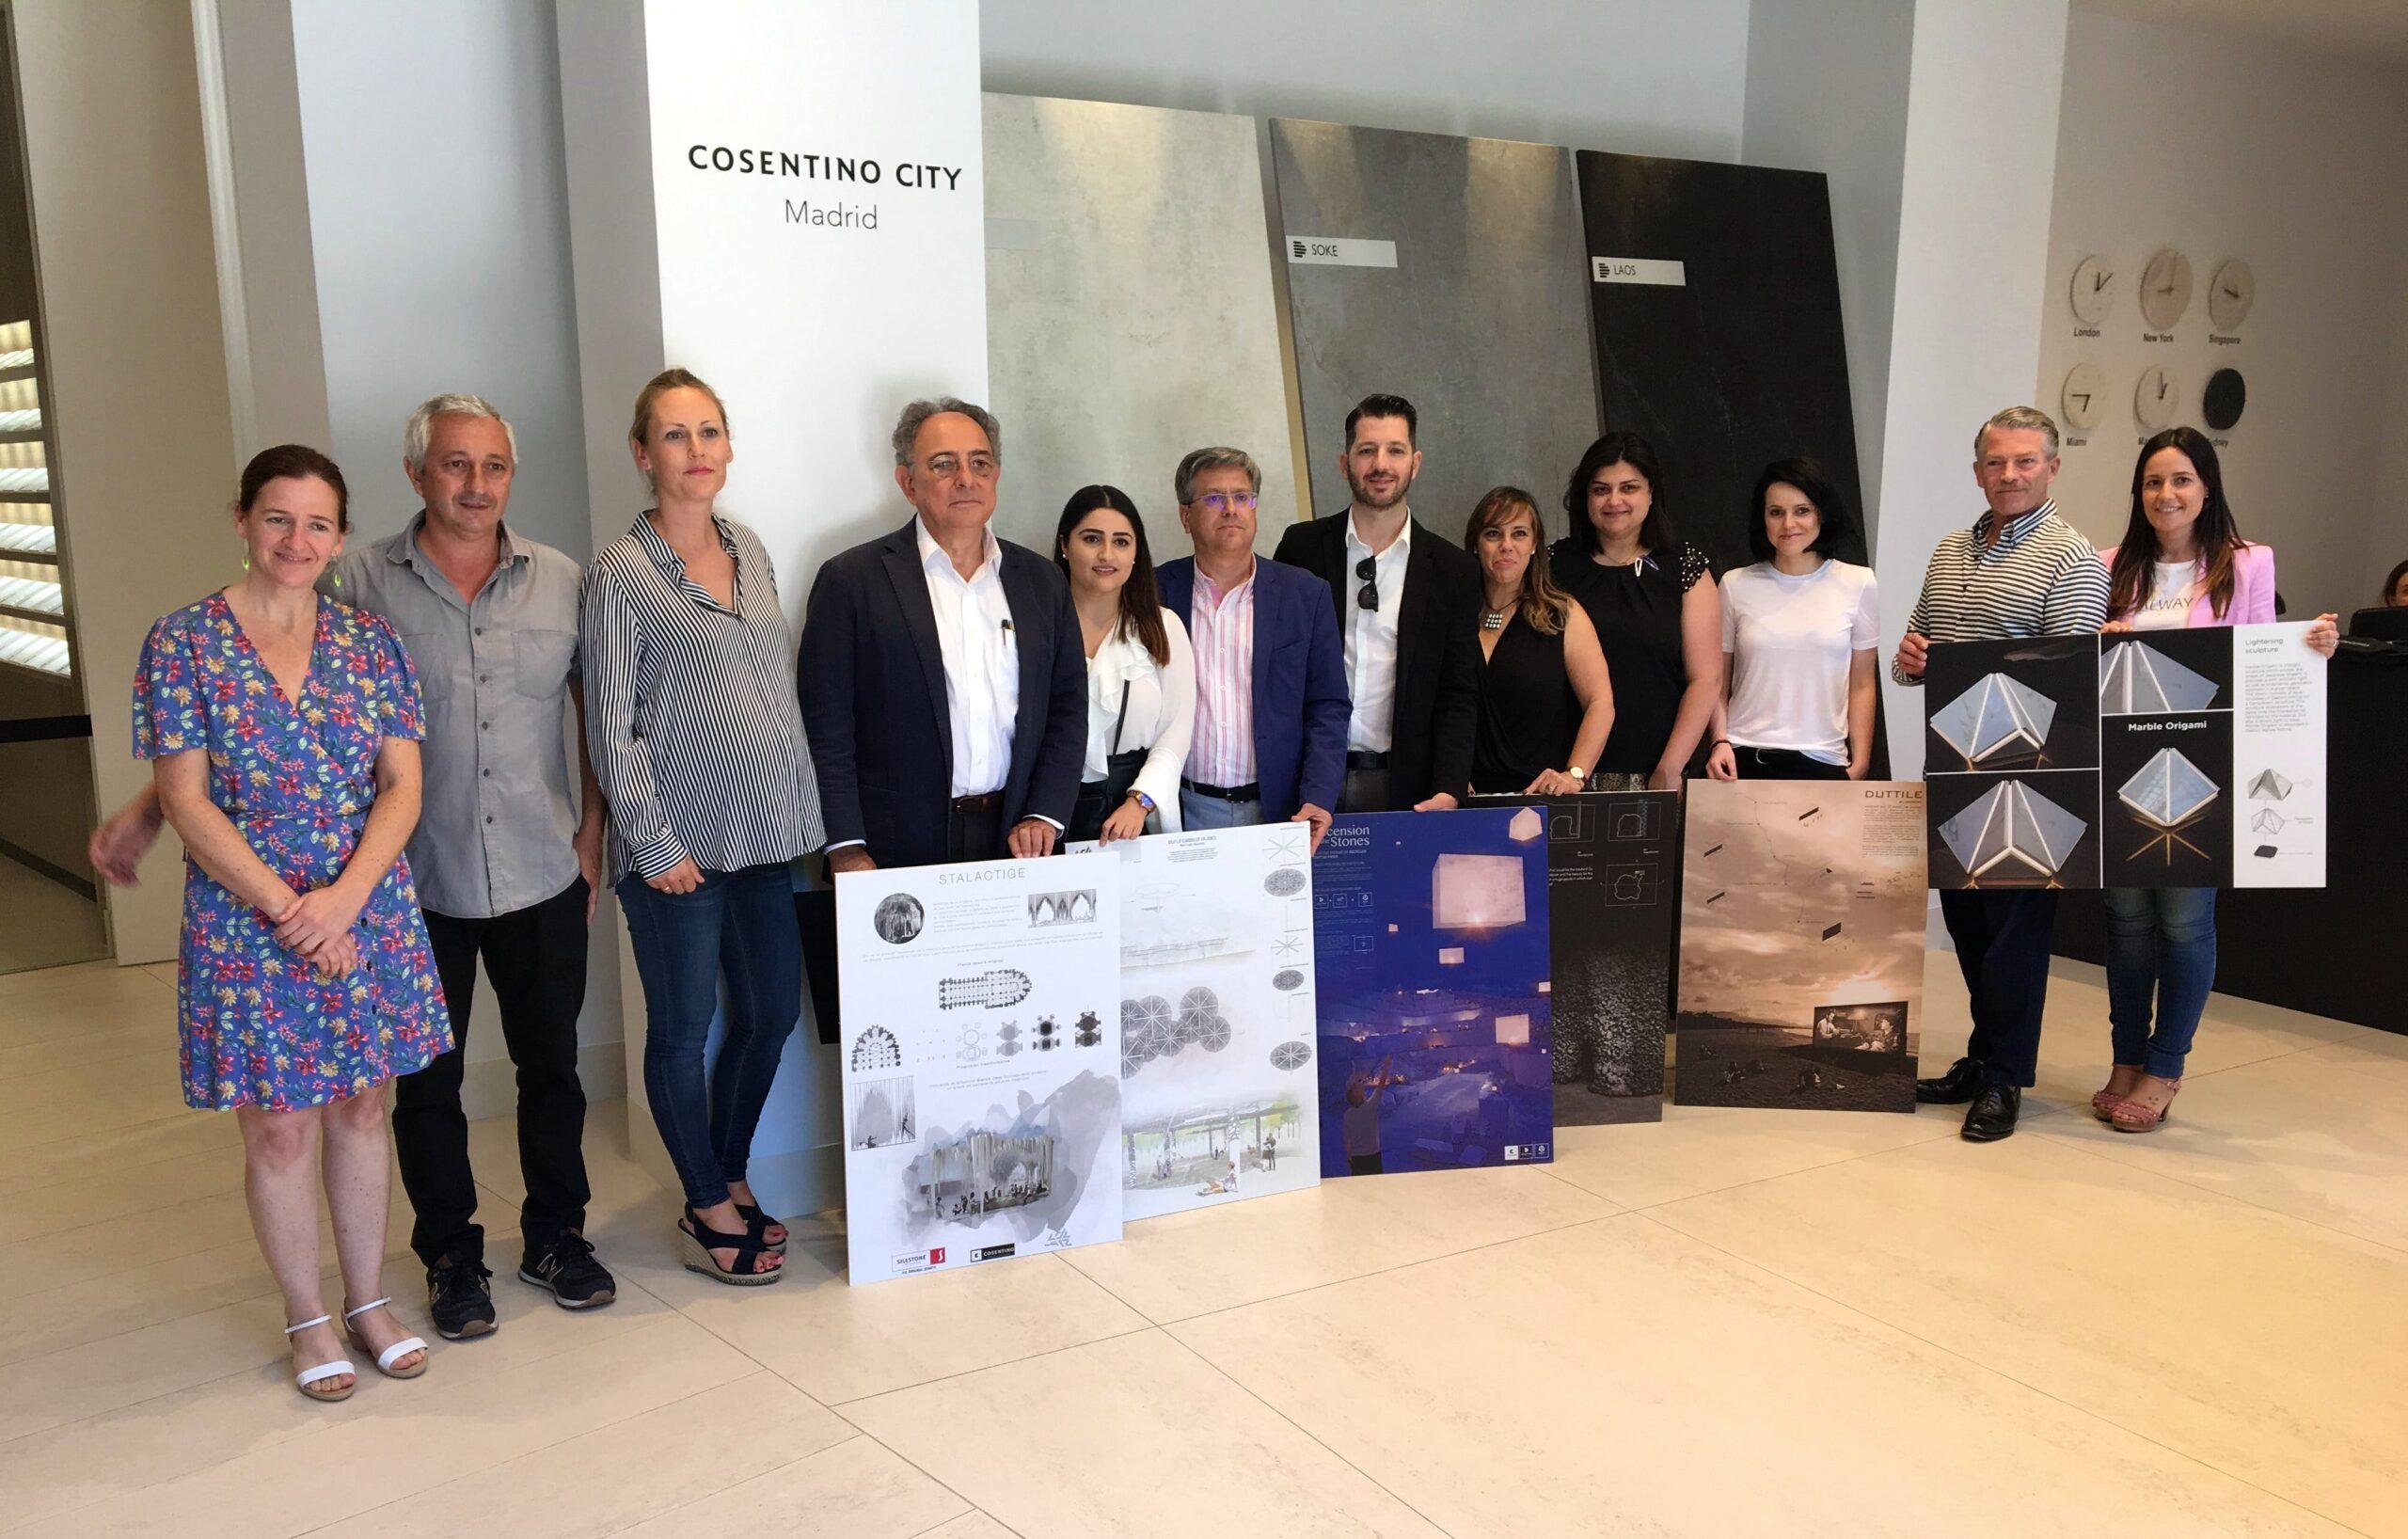 Image of Jurado Ganadores CDC12 2 2 scaled in 12th Cosentino Design Challenge Winners - Cosentino